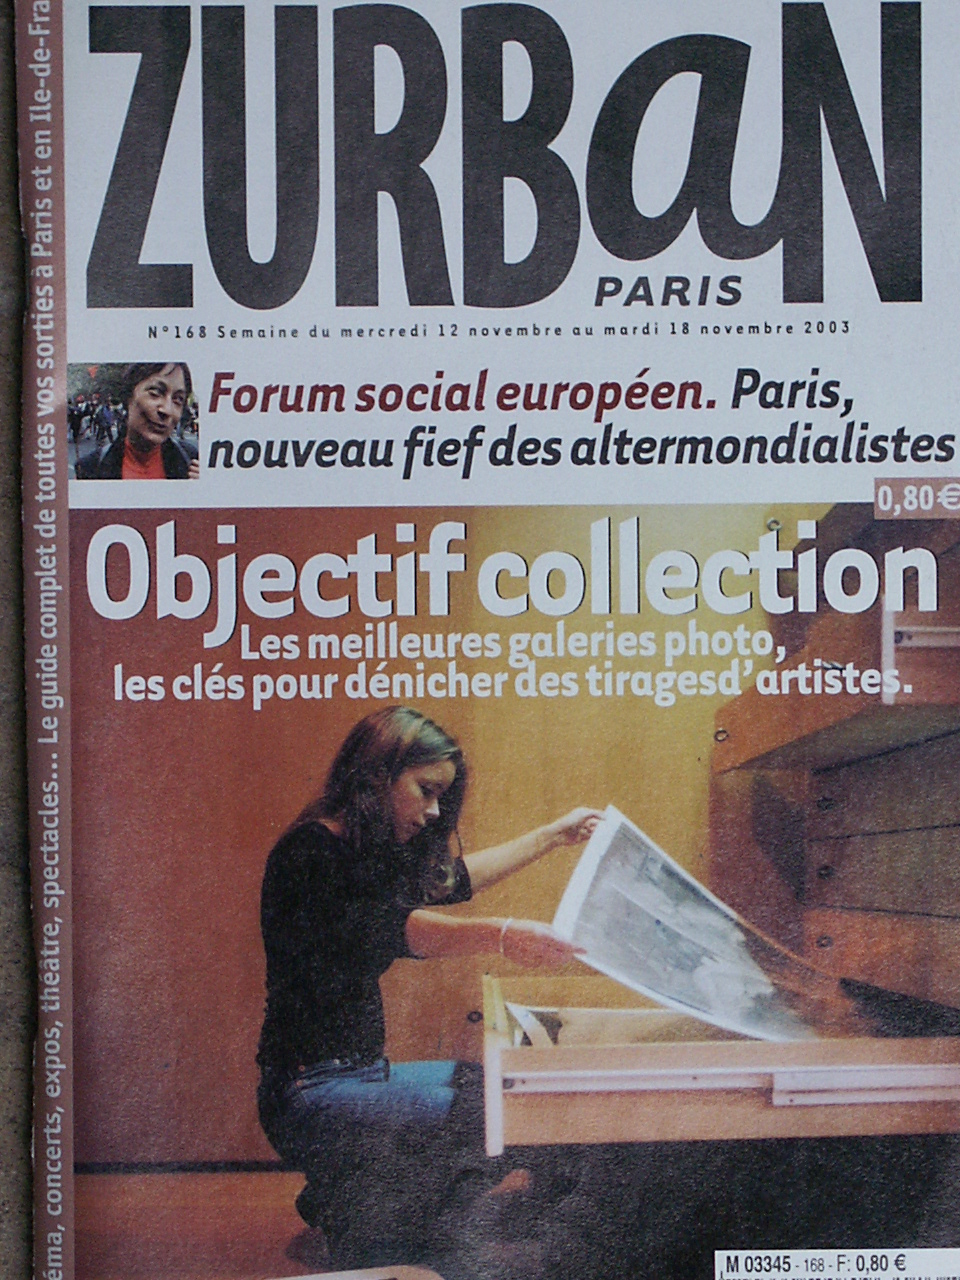 2003 Zurban Nov 2003 - Couve.JPG